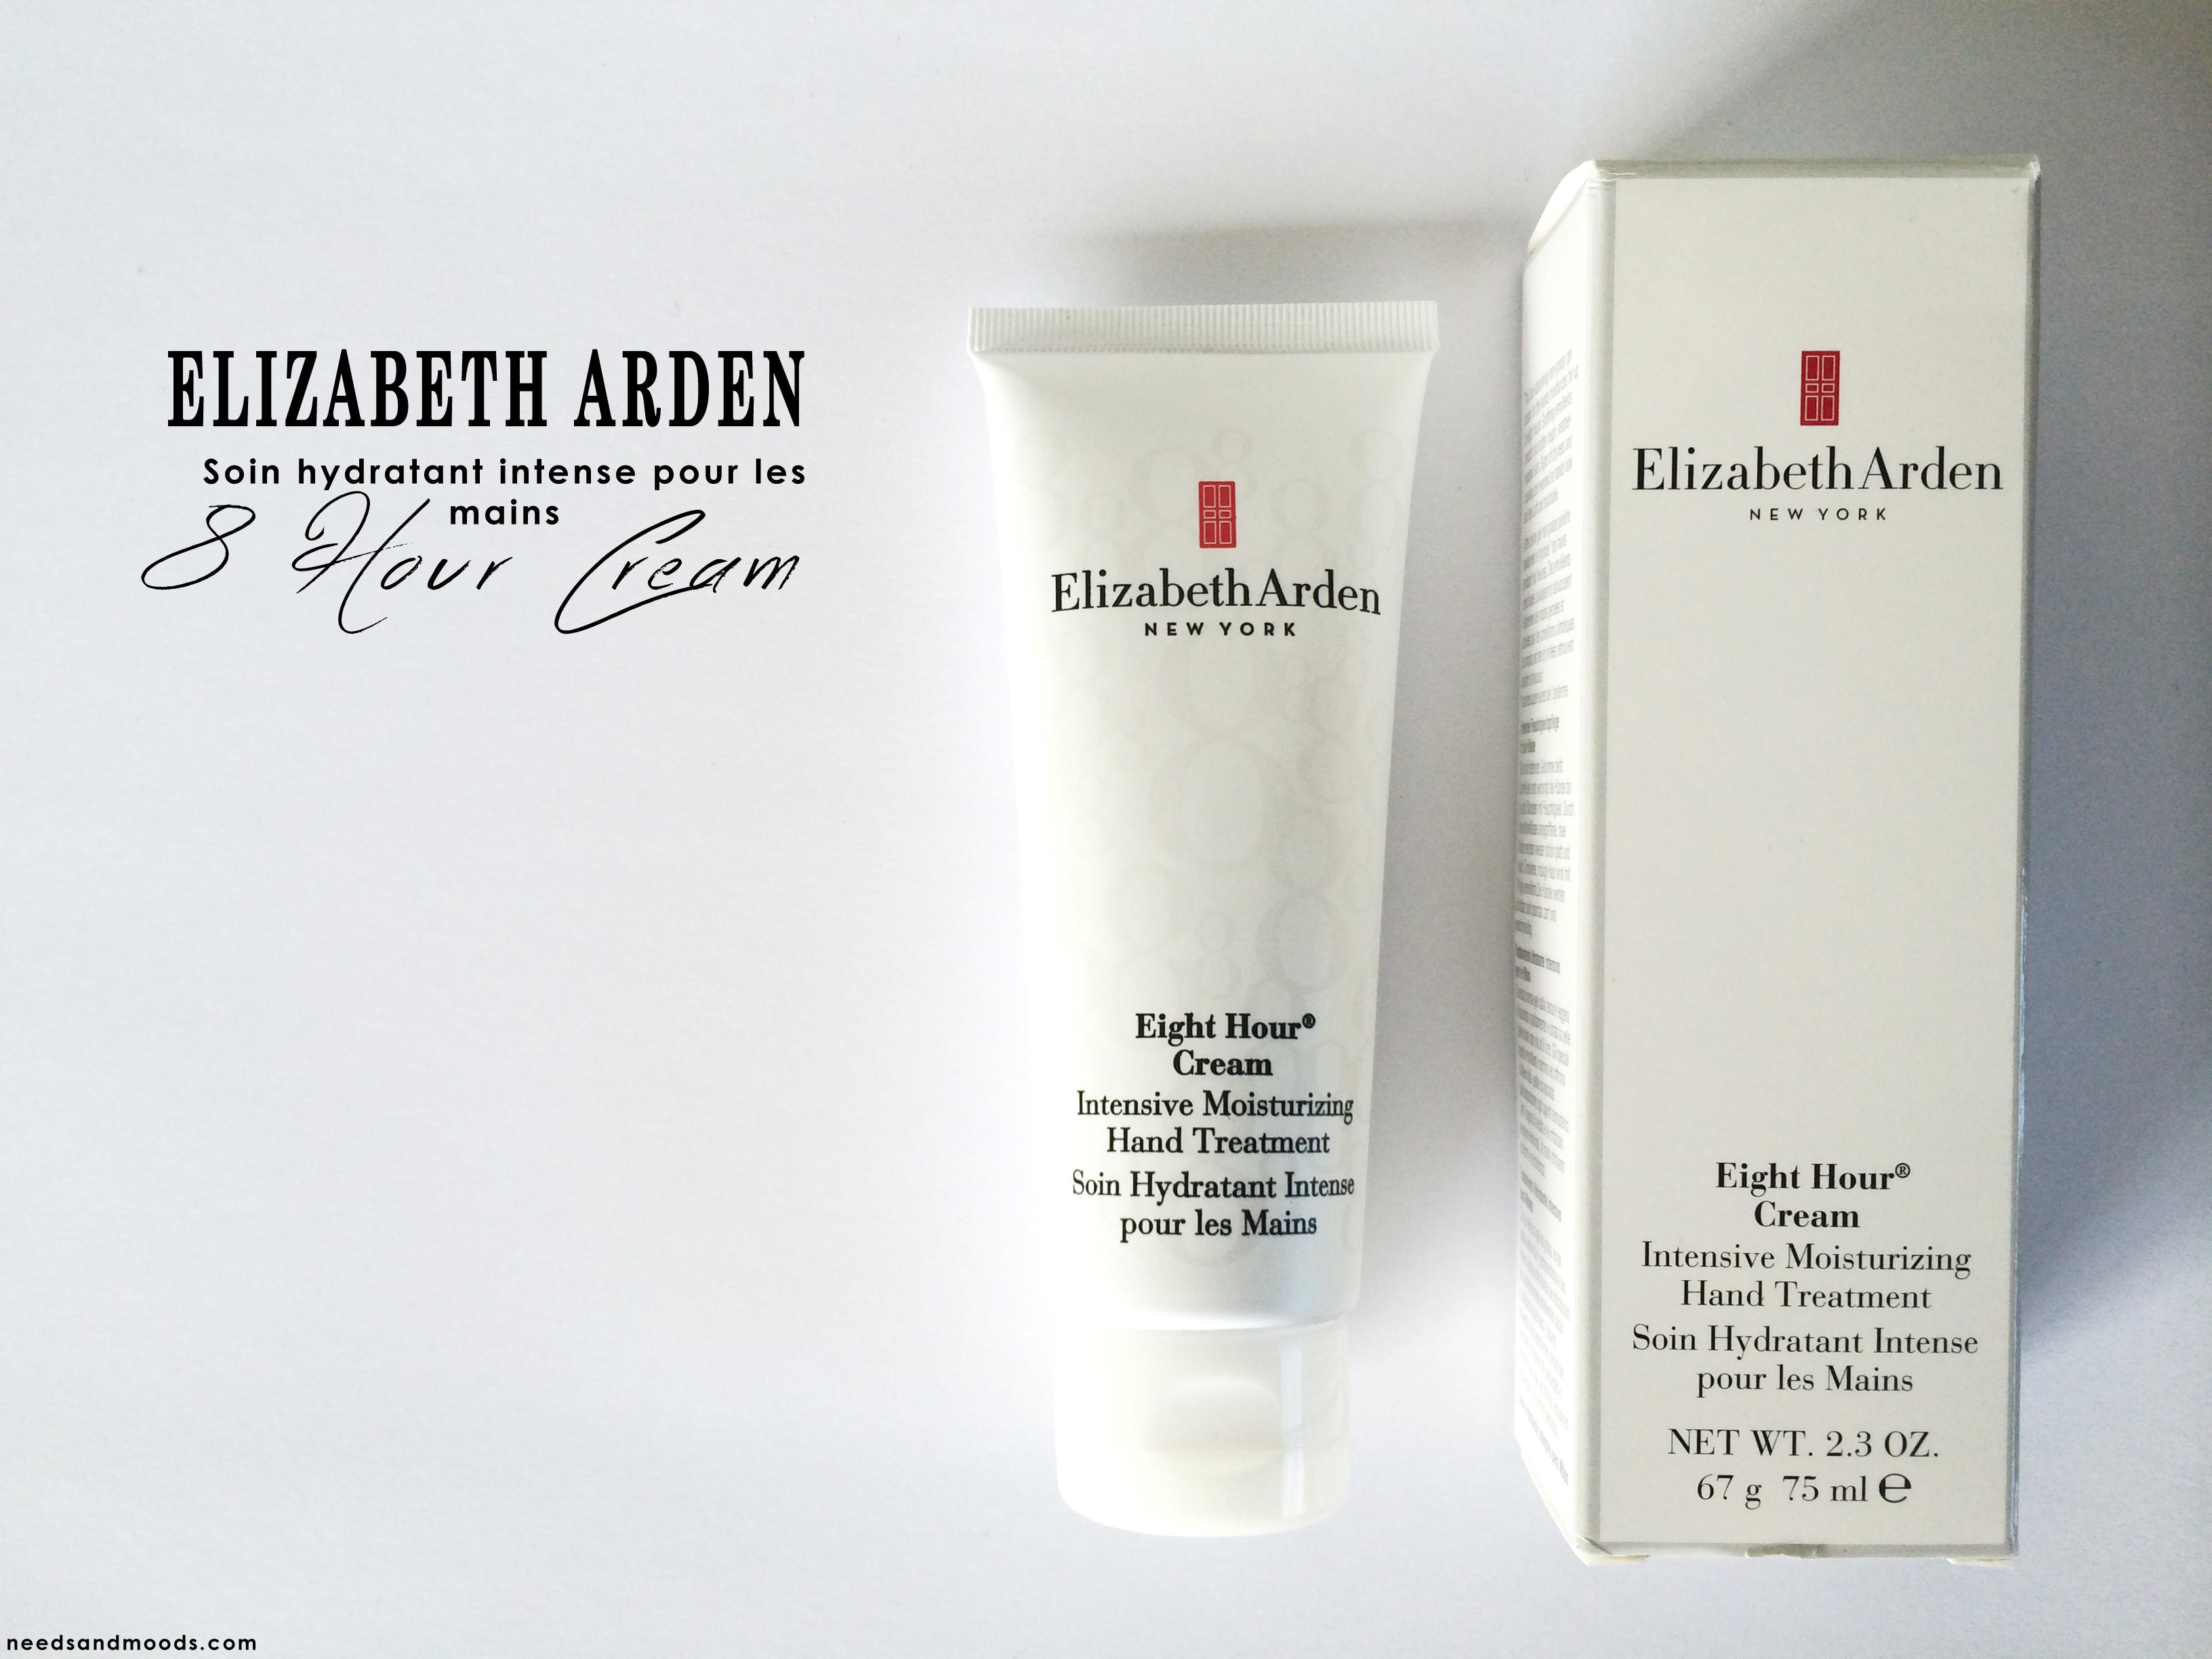 Tidssvarende 8 Hour Cream par Elizabeth Arden.. | Blog Beauté, Needs and Moods NH-21